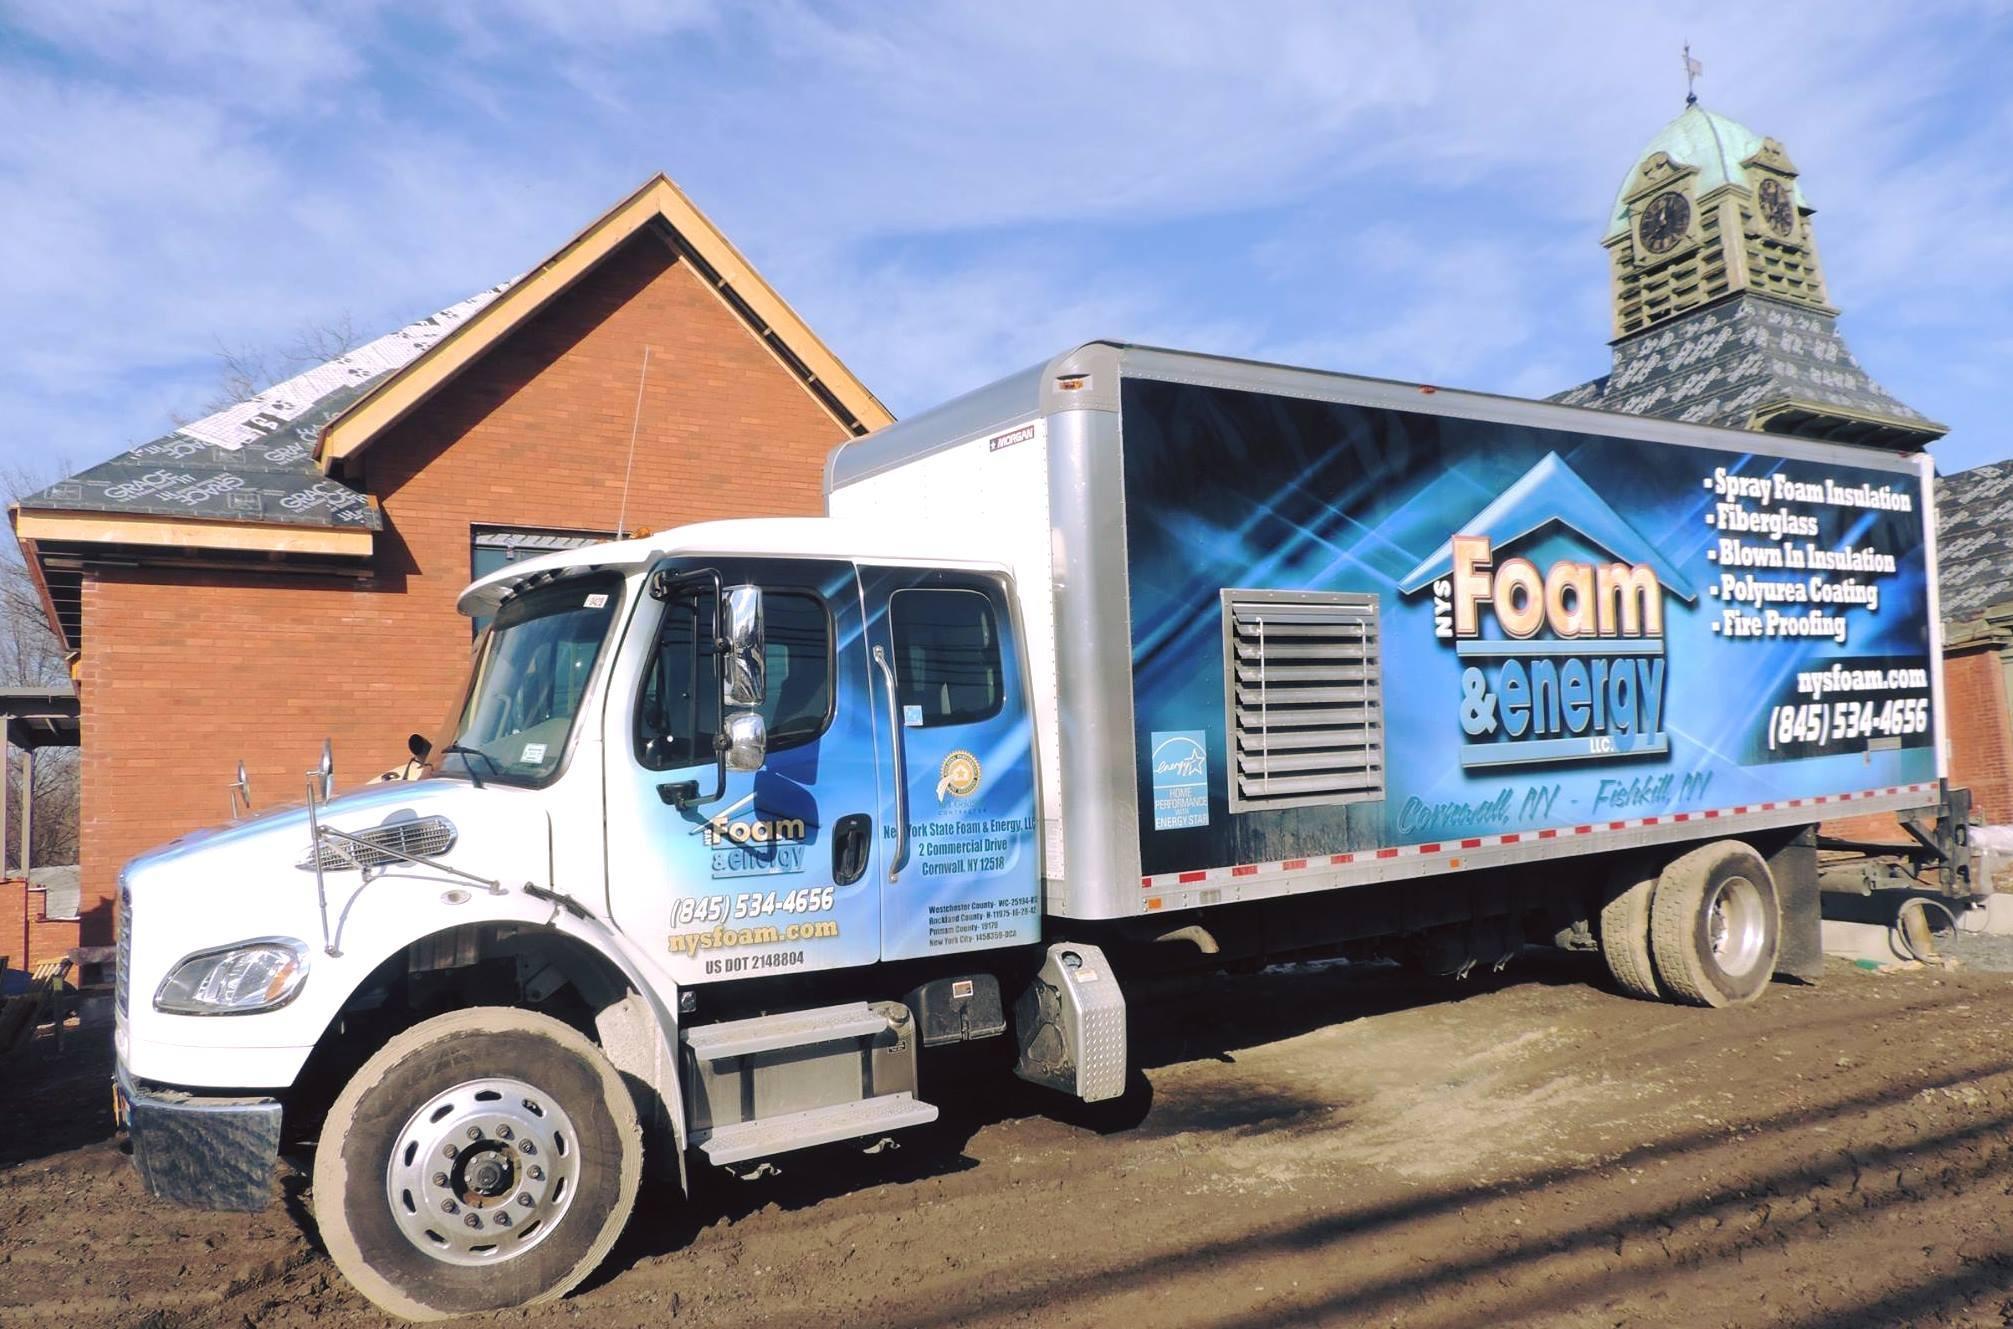 NYS Foam & Energy LLC image 5